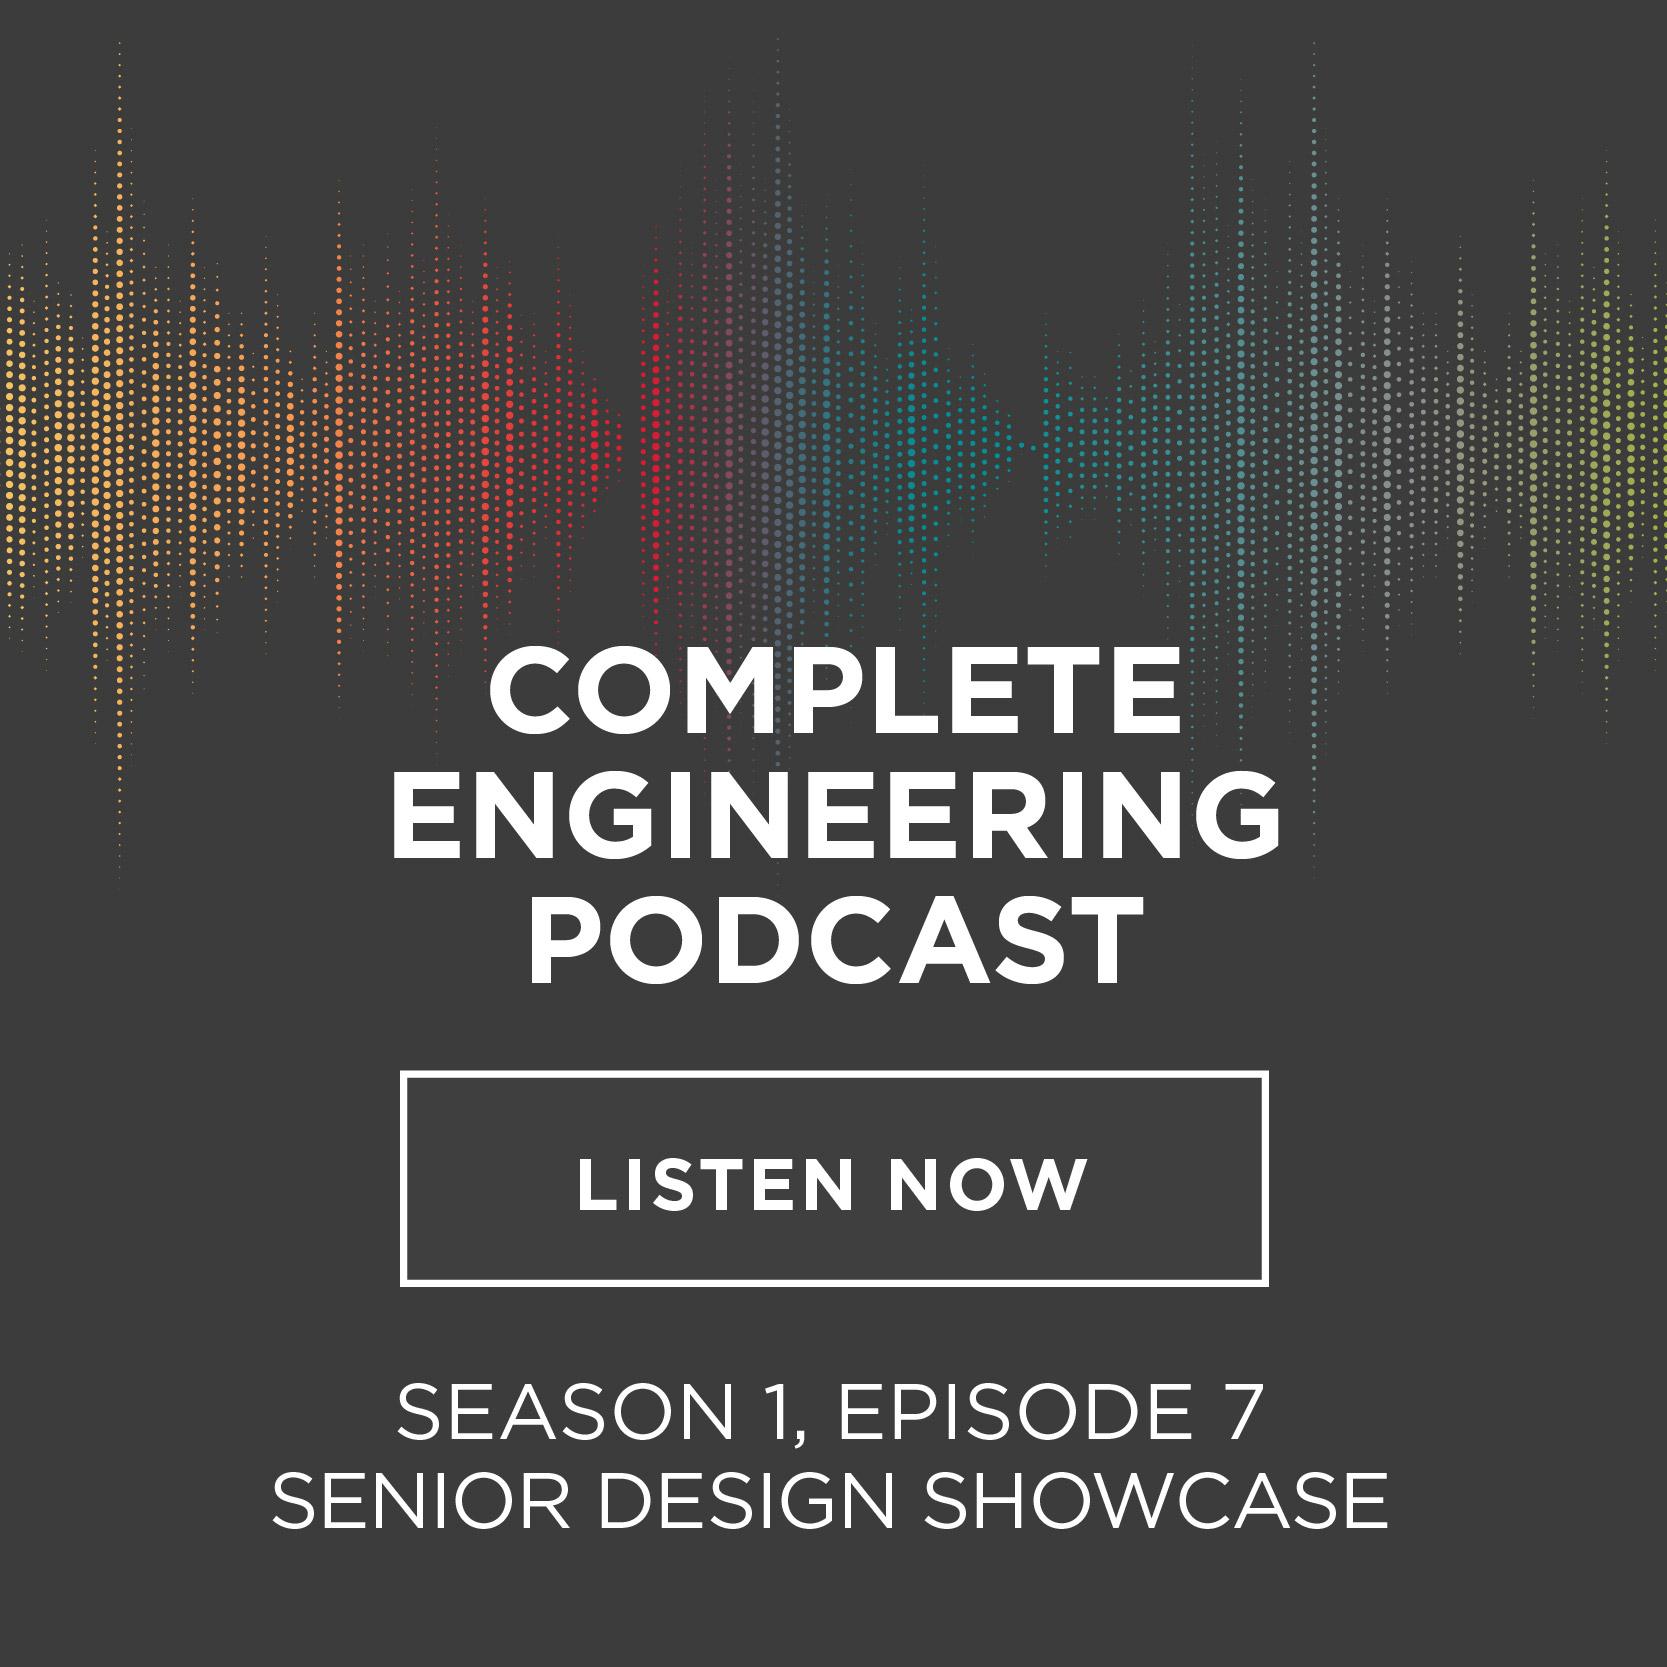 Complete Engineering Podcast - Season 1, Episode 7, Senior Design Showcase: Listen Now